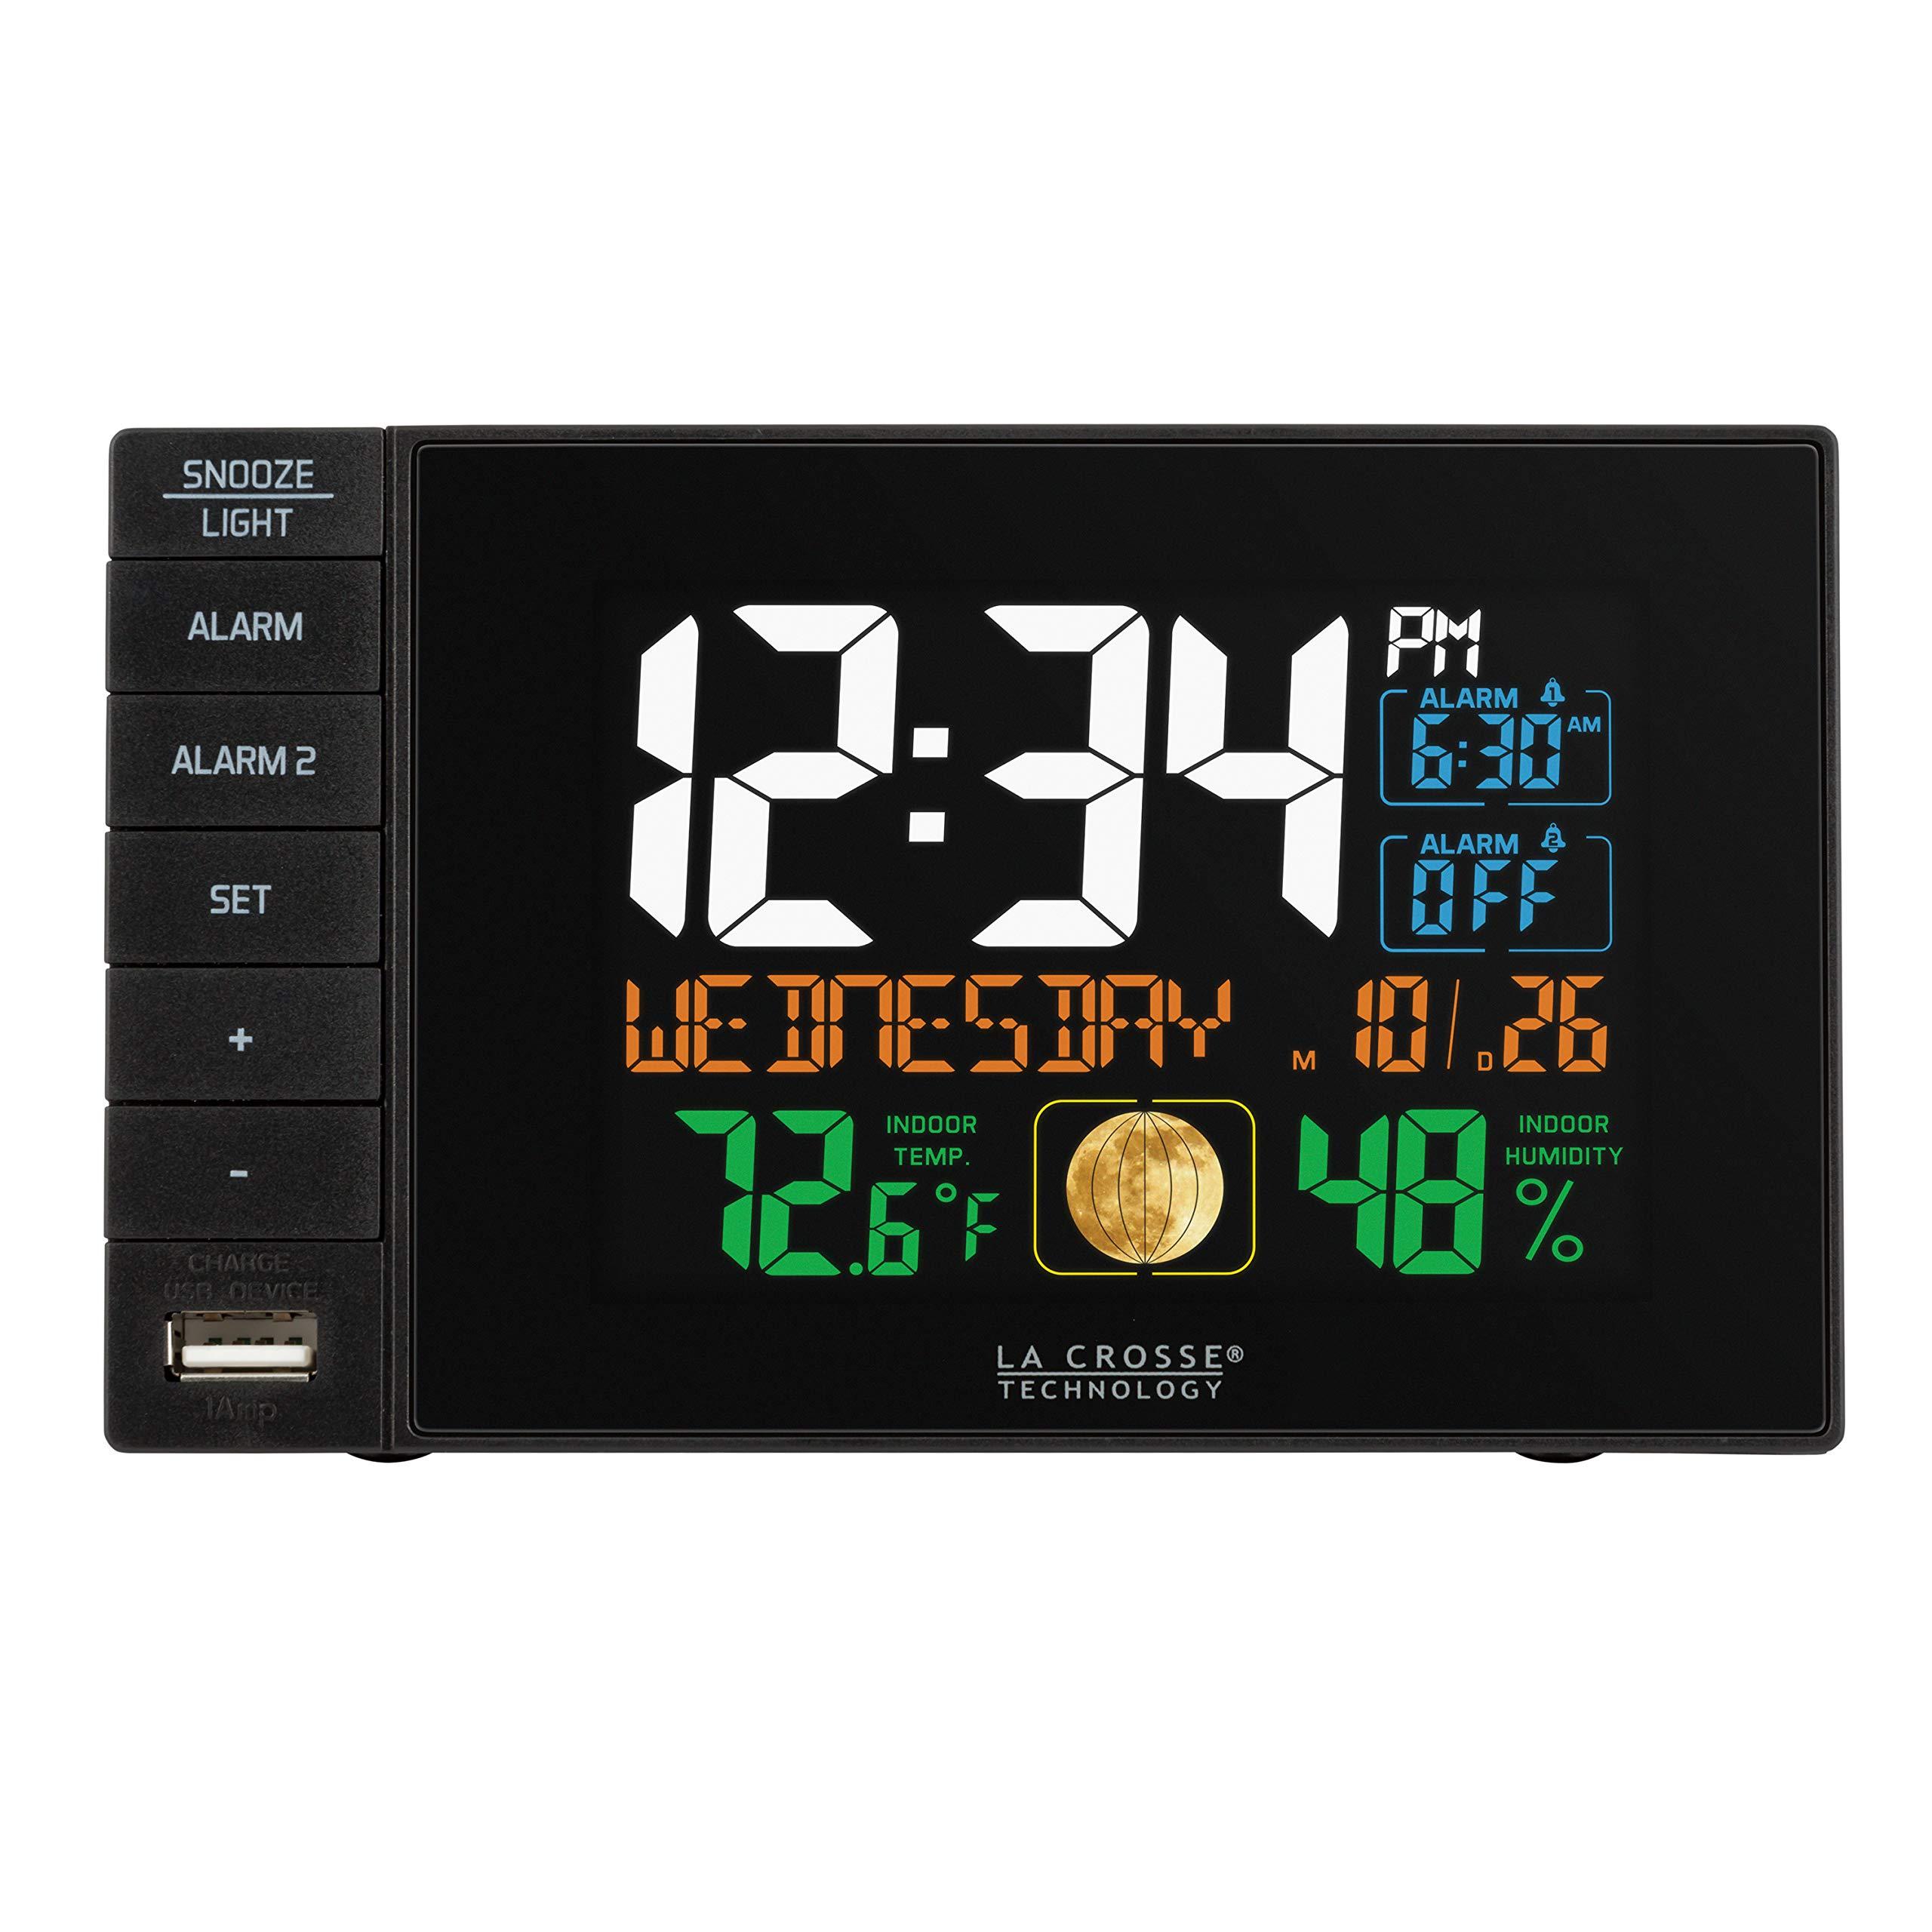 La Crosse Technology C87207 Color Dual Alarm Clock with USB Charging Port